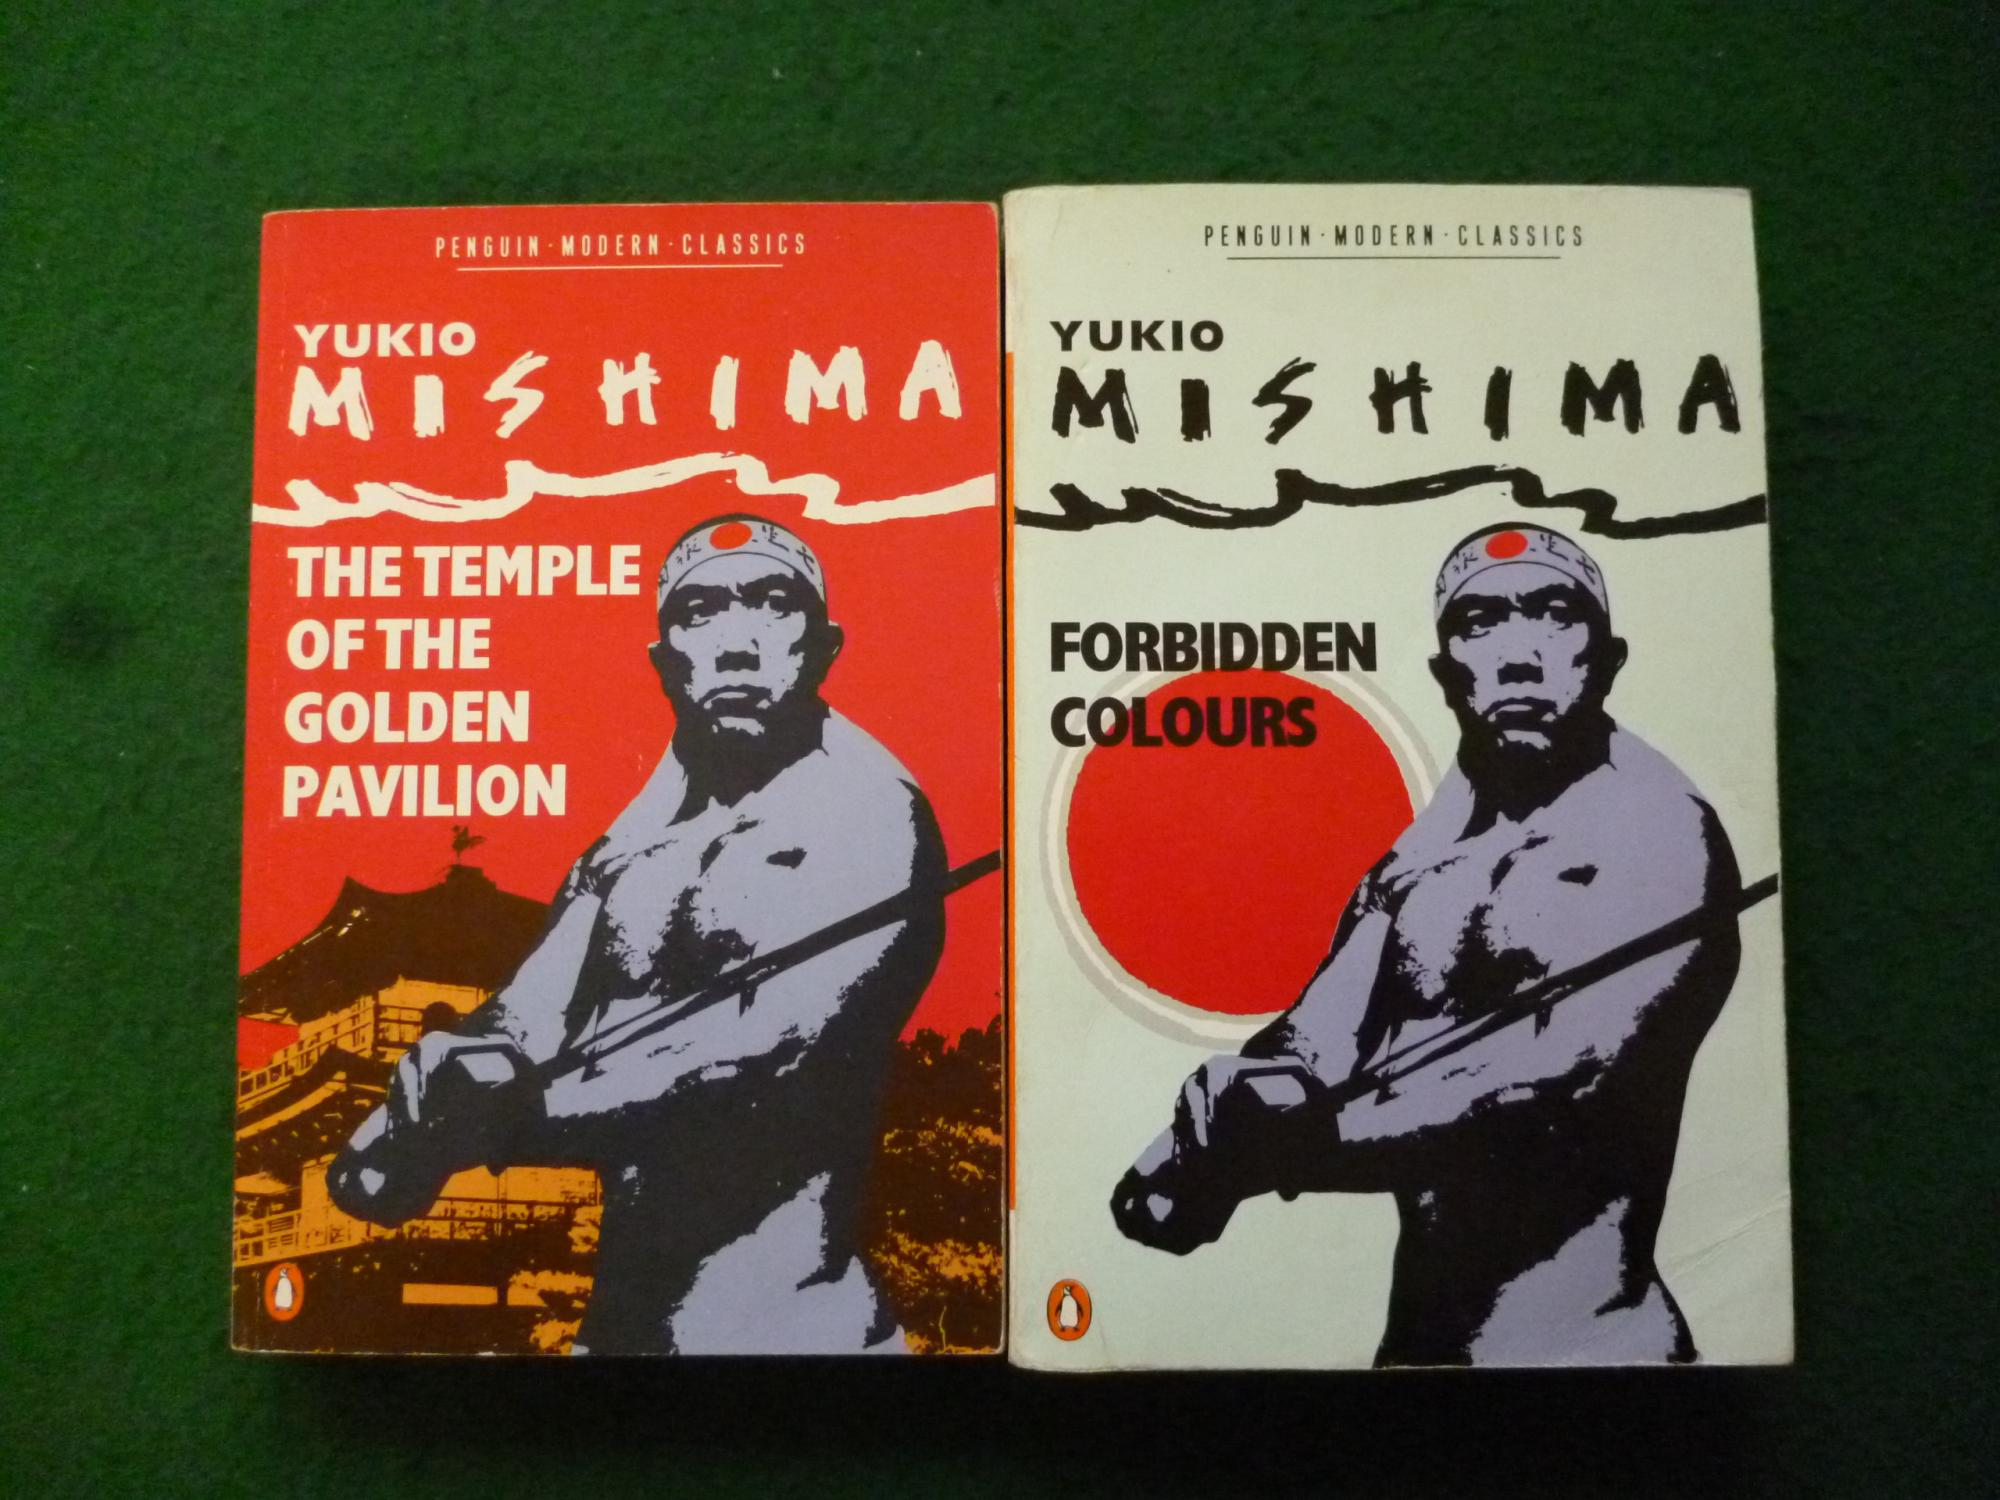 Penguin Modern Classics Book Covers ~ Forbidden colours penguin modern classics by yukio